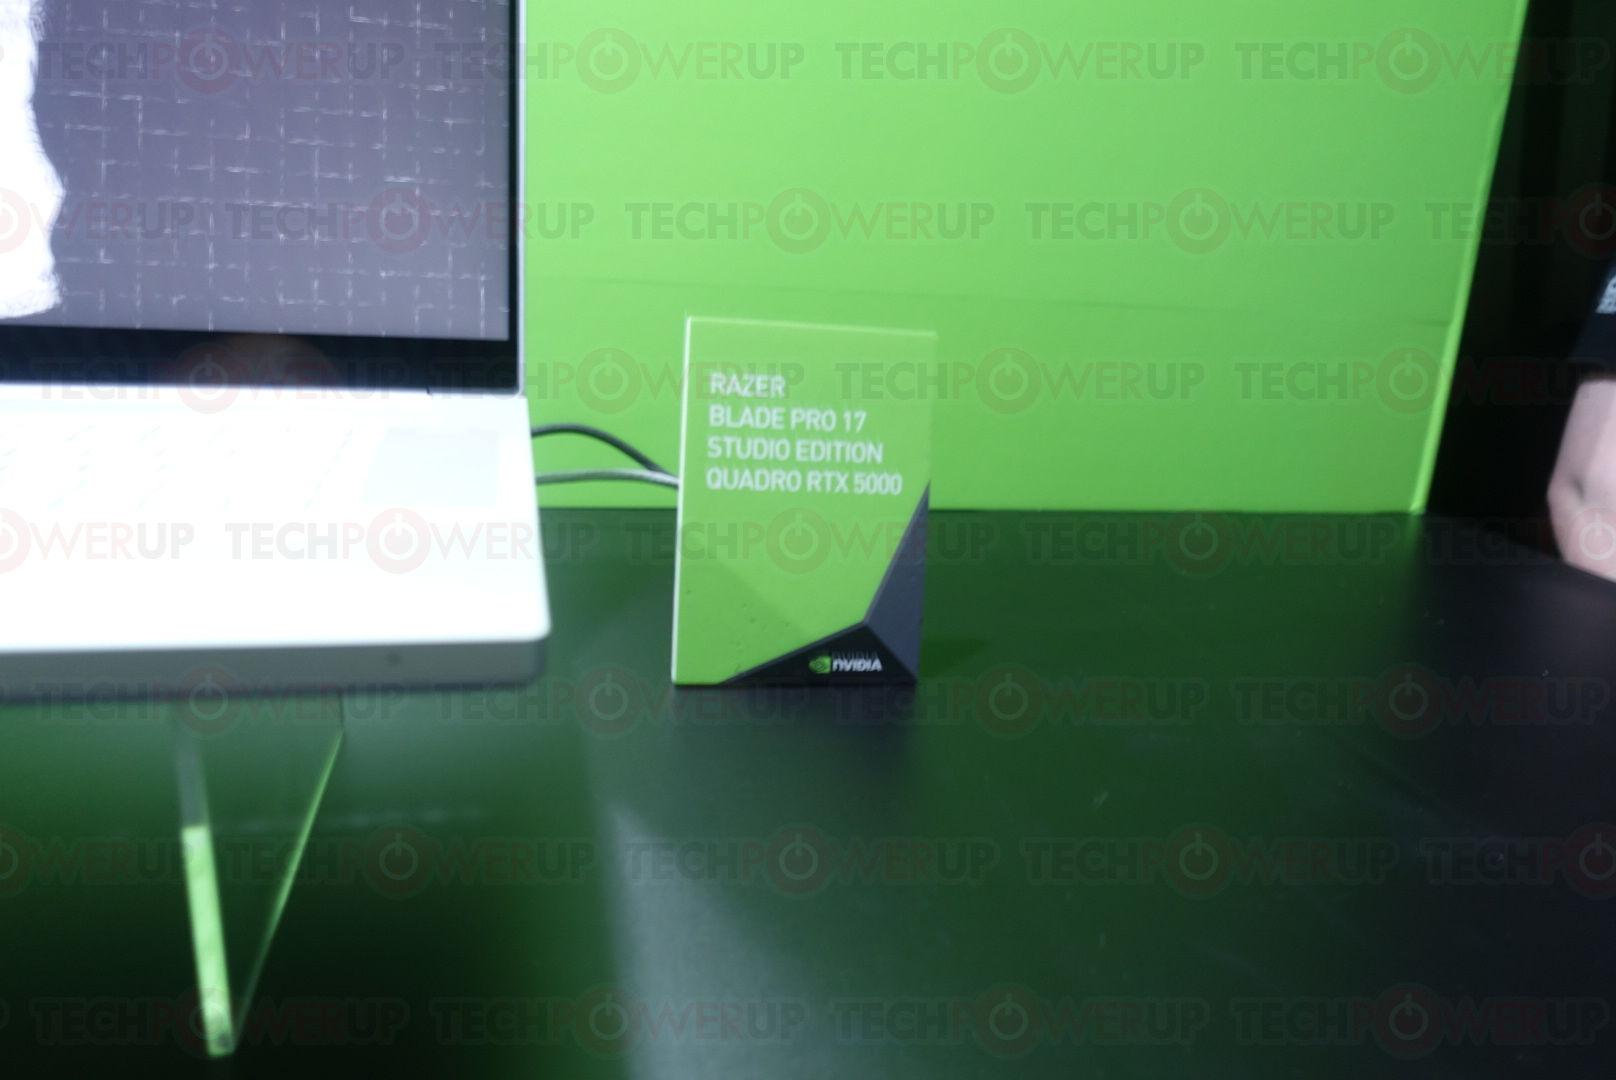 Computex 2019 Live Coverage | TechPowerUp